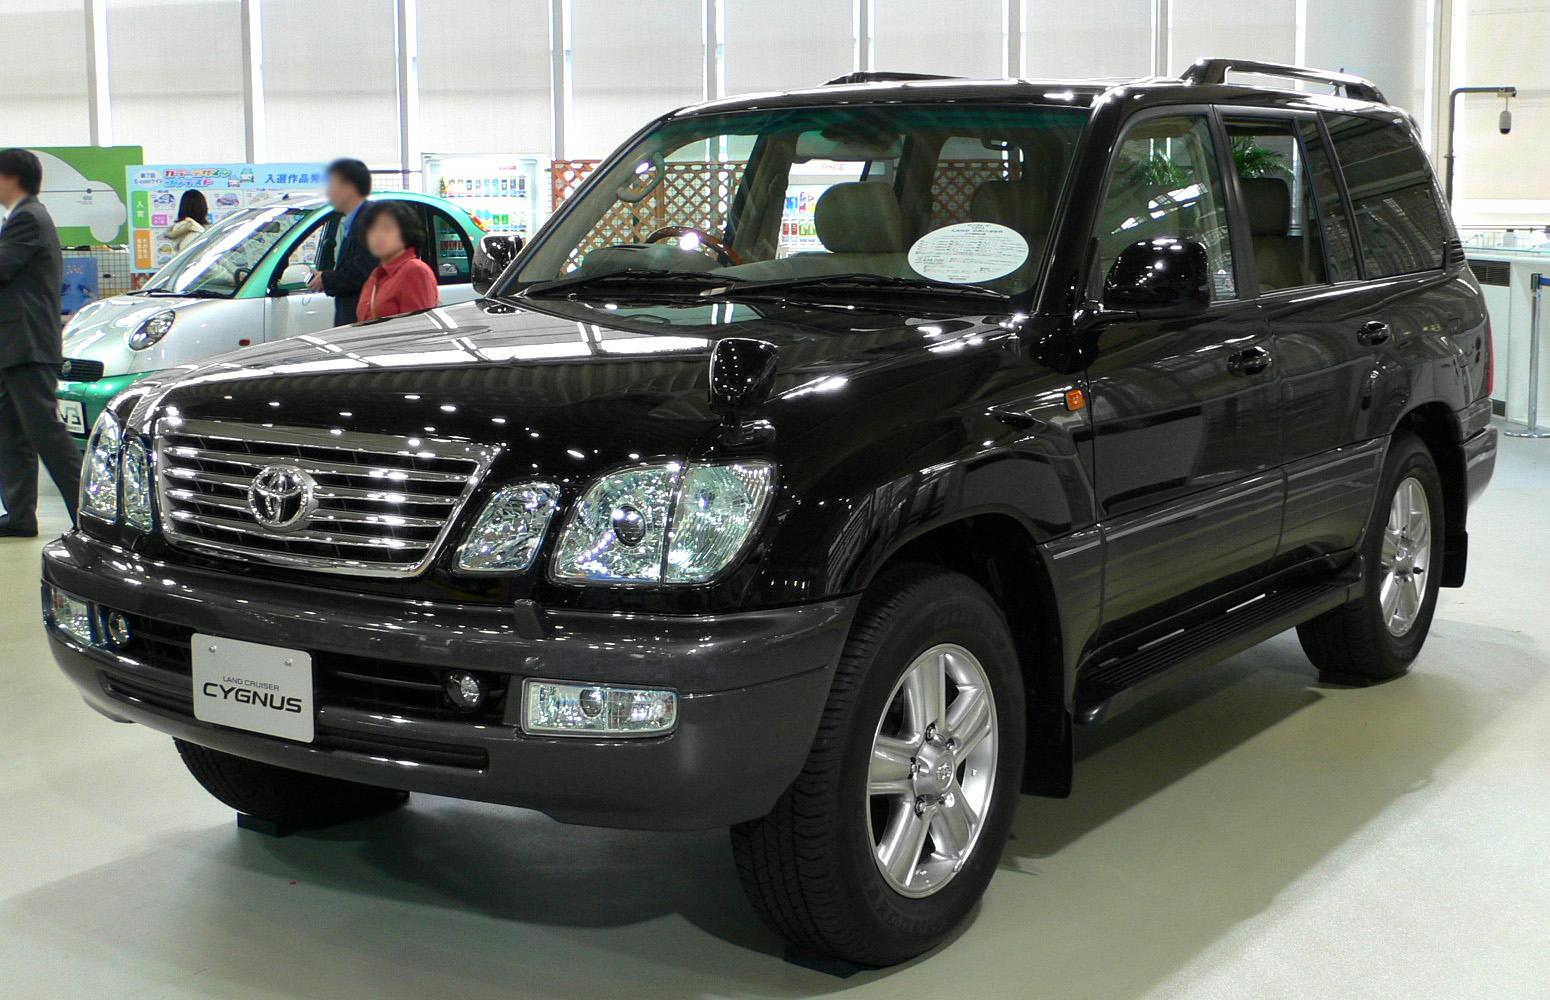 Description 2005 Toyota Land Cruiser-cygnus 02.jpg